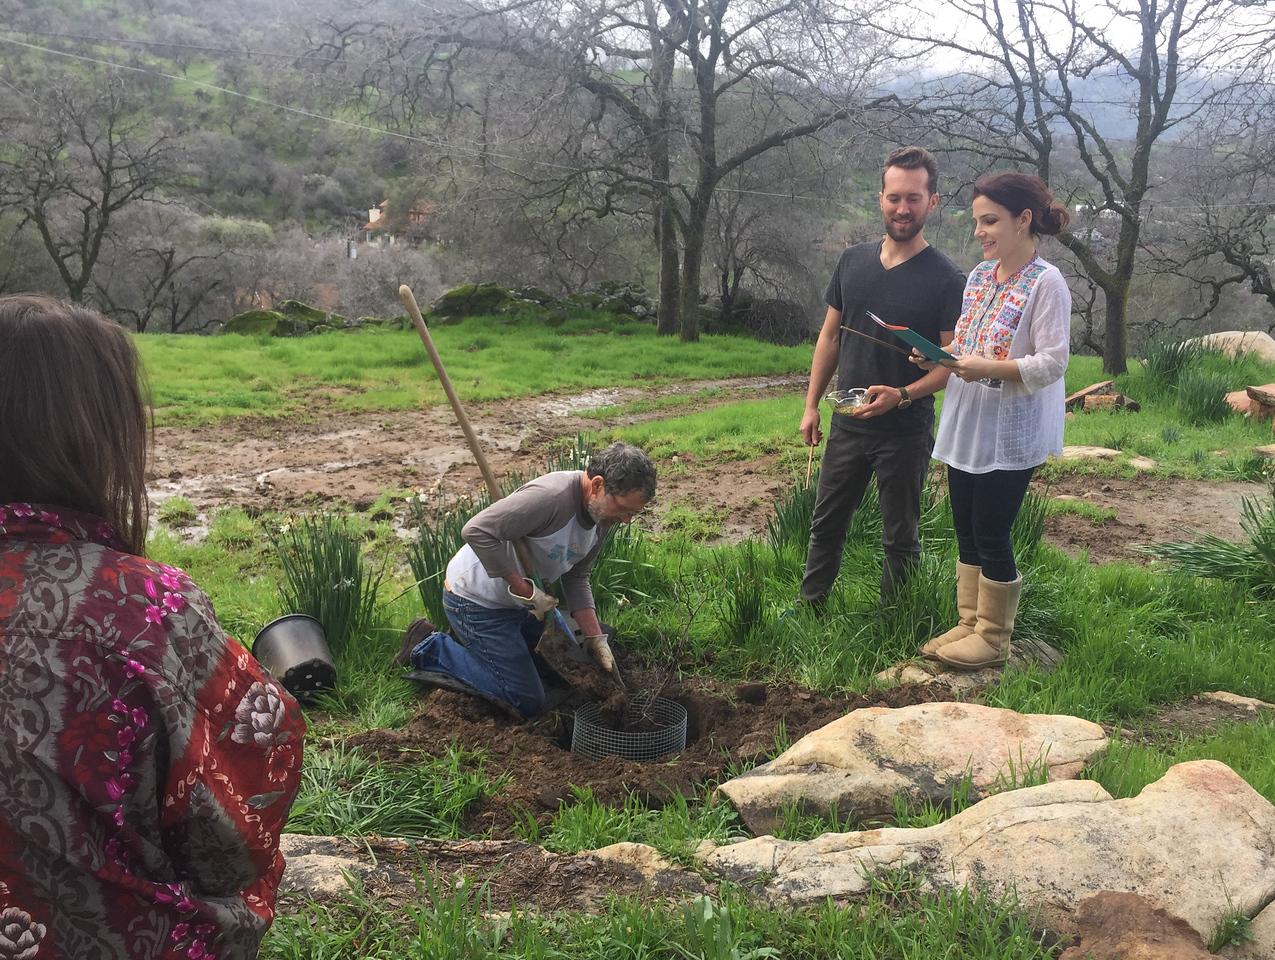 Wedding Tree Planting - The Longstreet/Rudisill redbud tree